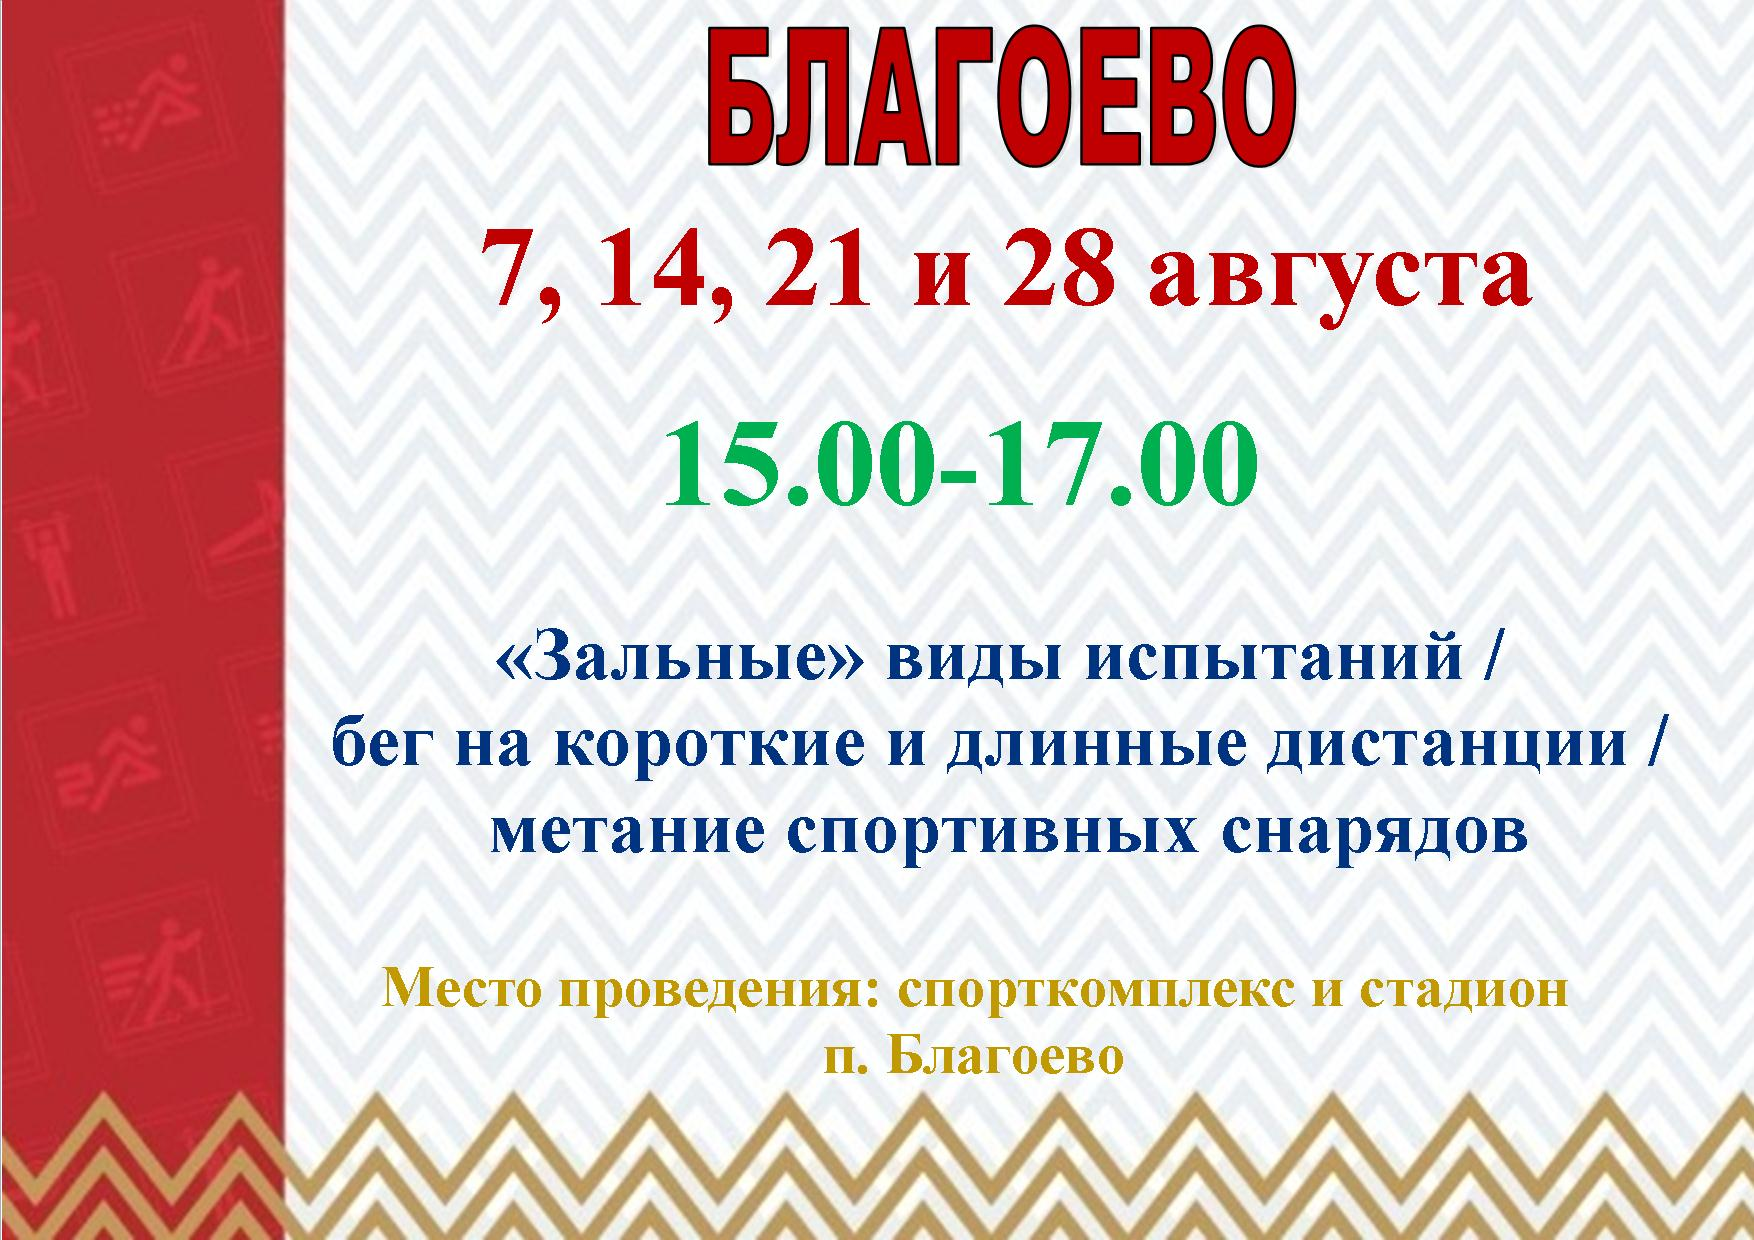 ГРАФИК ТЕСТИРОВАНИЙ ГТО НА АВГУСТ